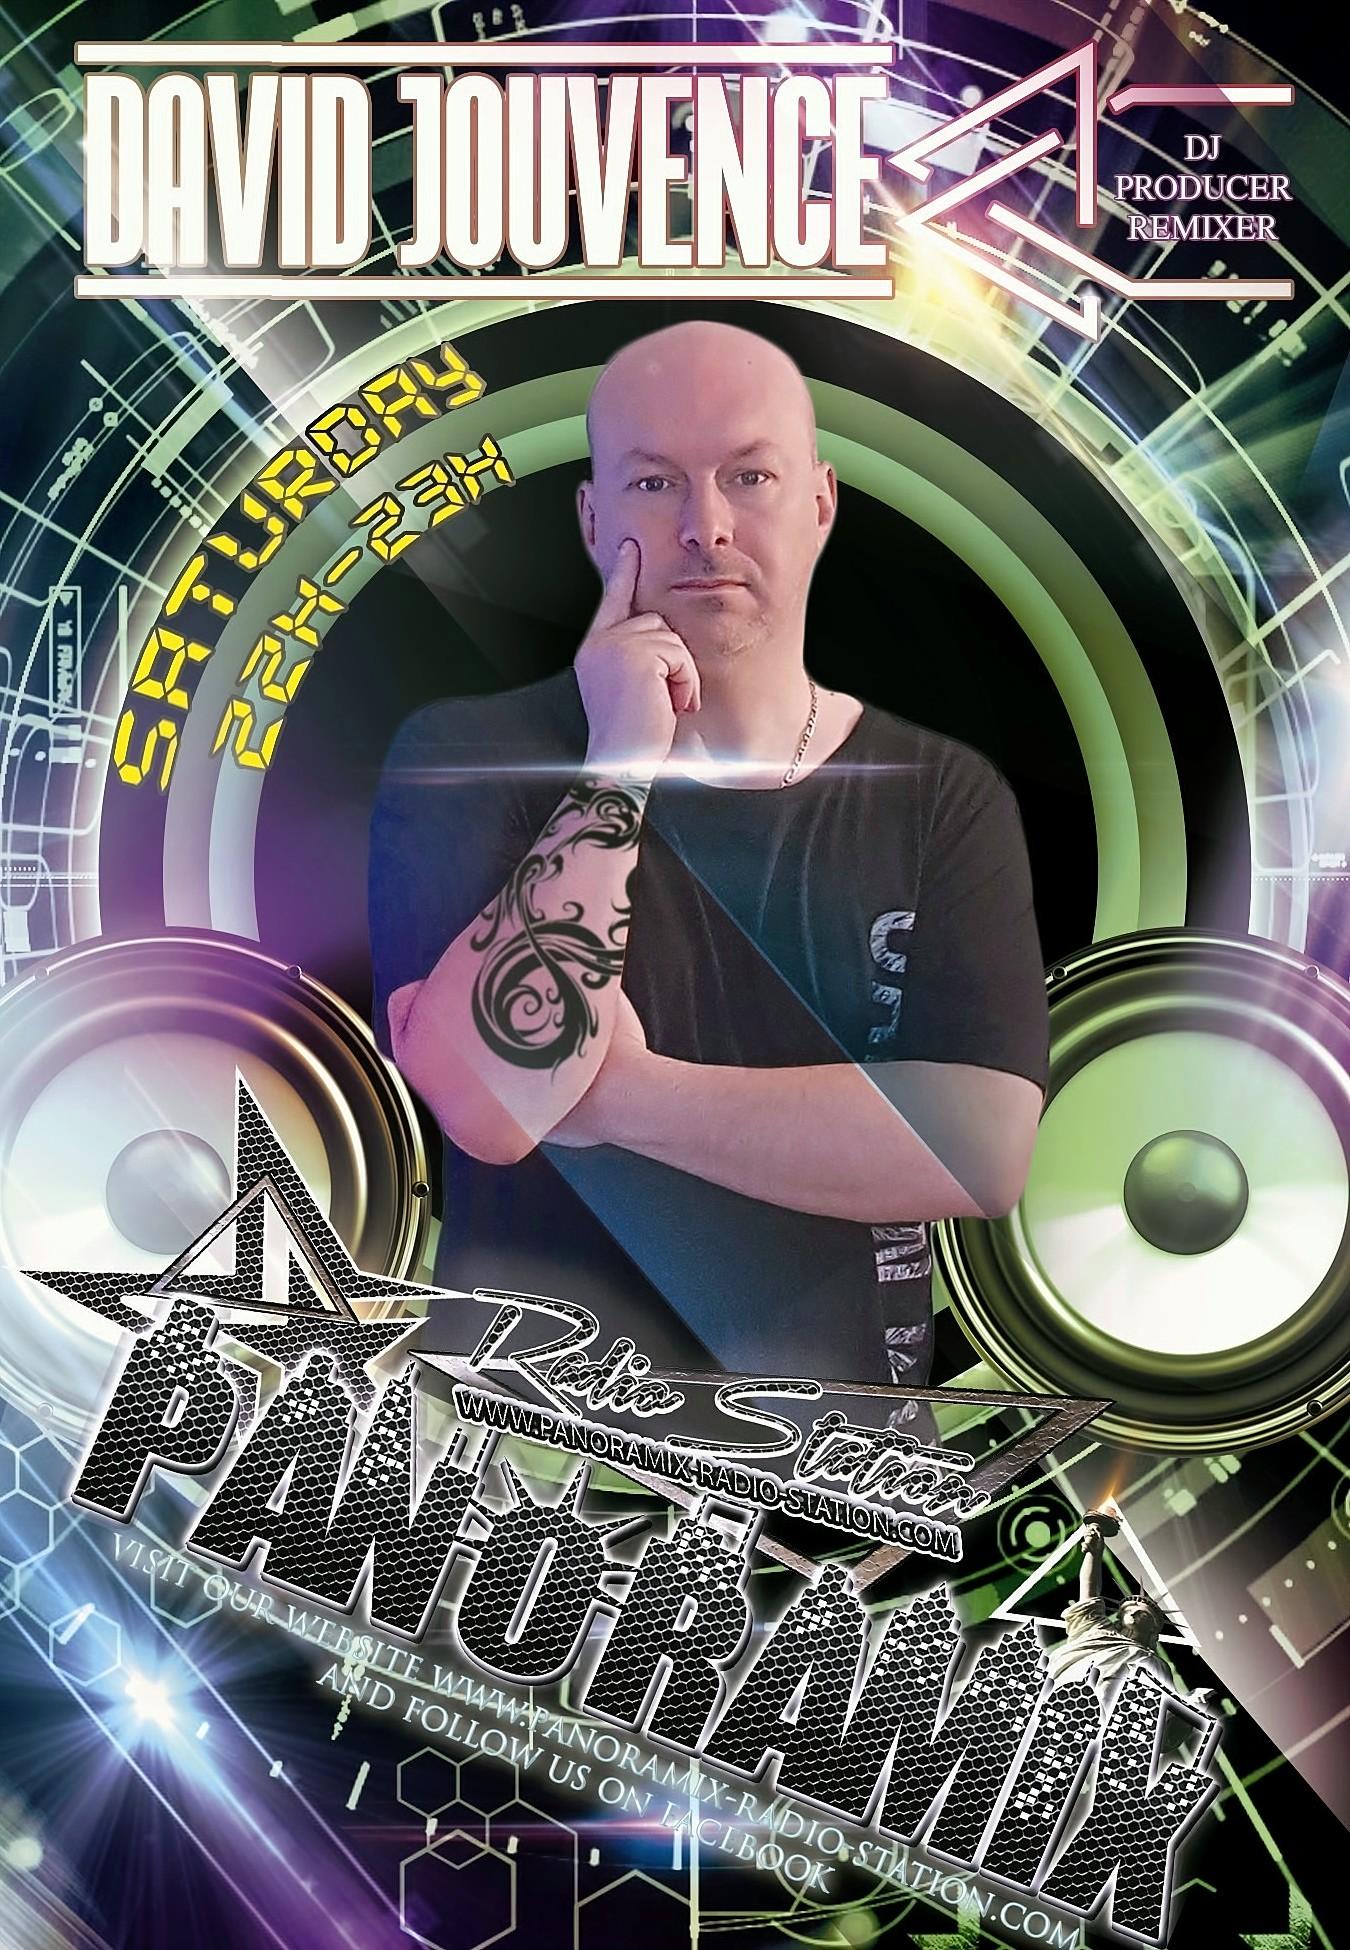 https://panoramix-radio-station.com/wp-content/uploads/2018/04/DAVID-JOUVENCE-Flyer-Panoramix-Radio.jpg